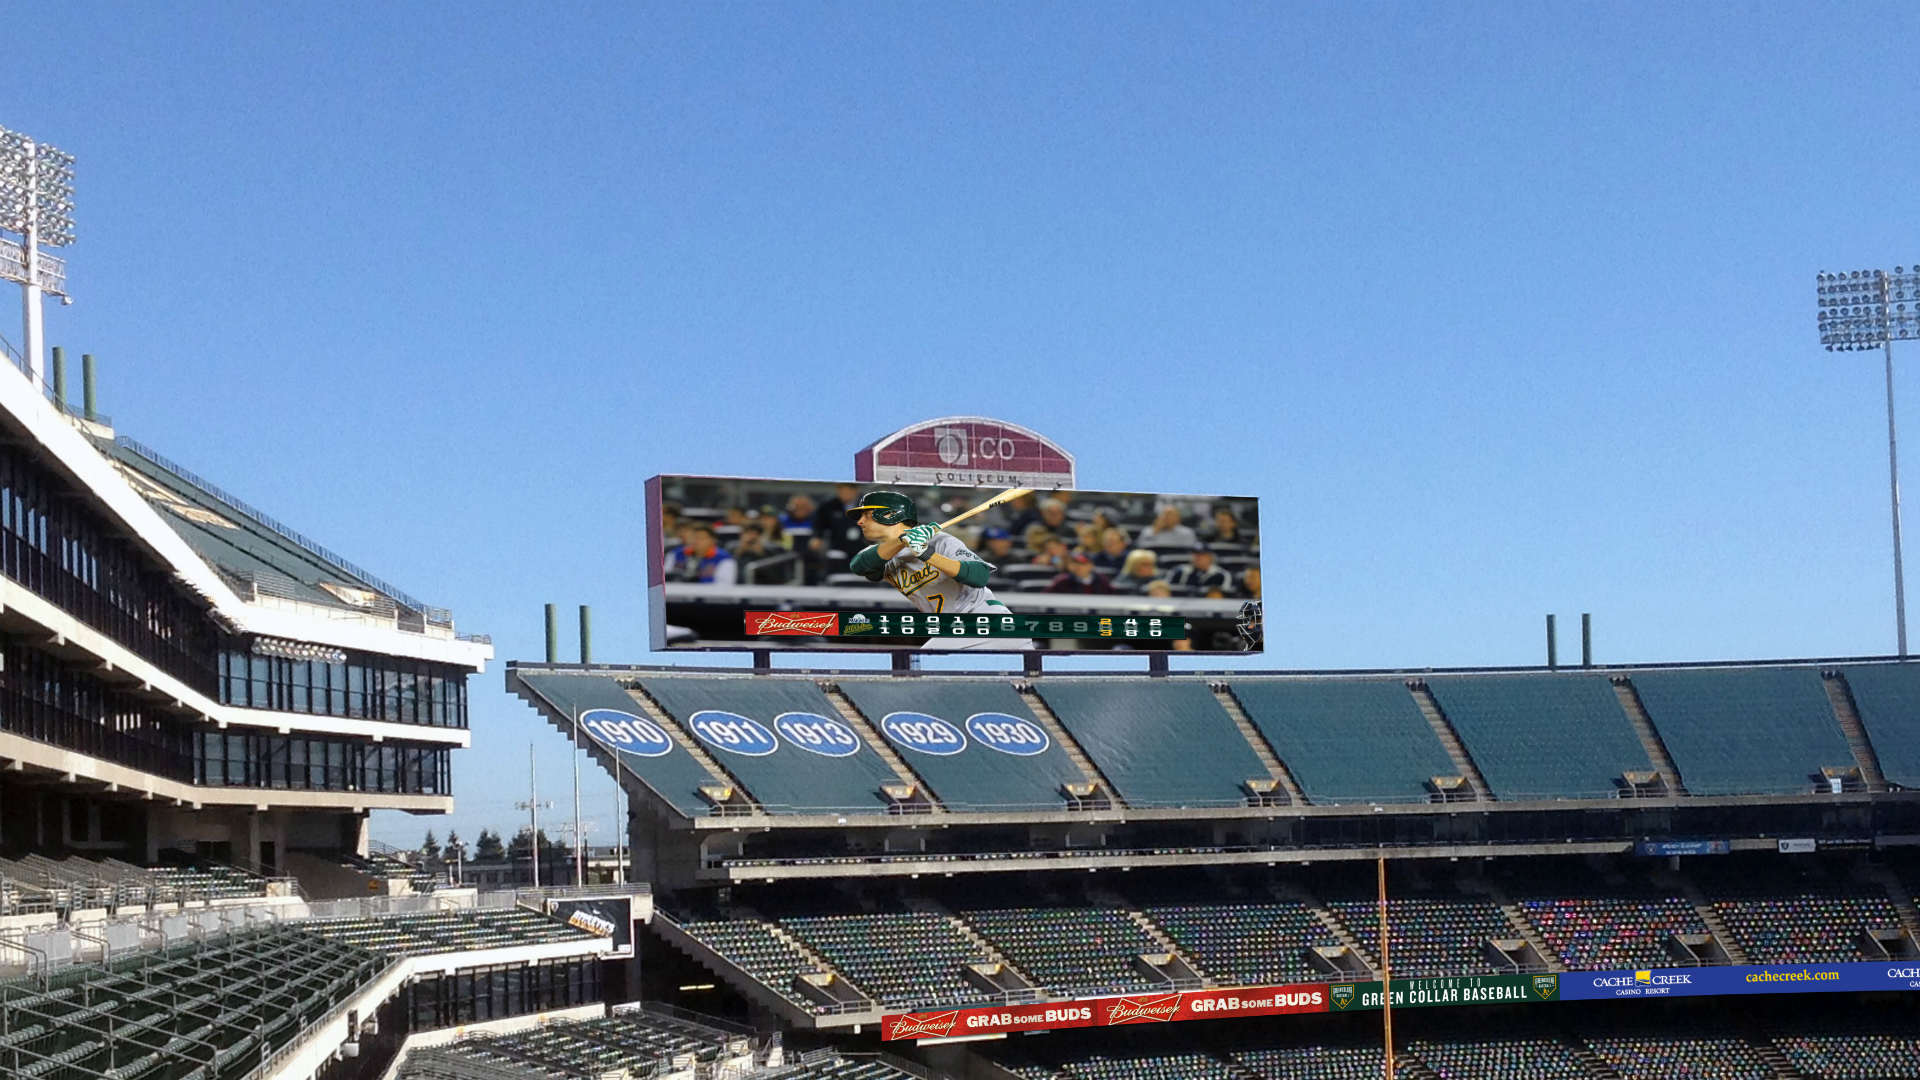 Oakland as jumbotron